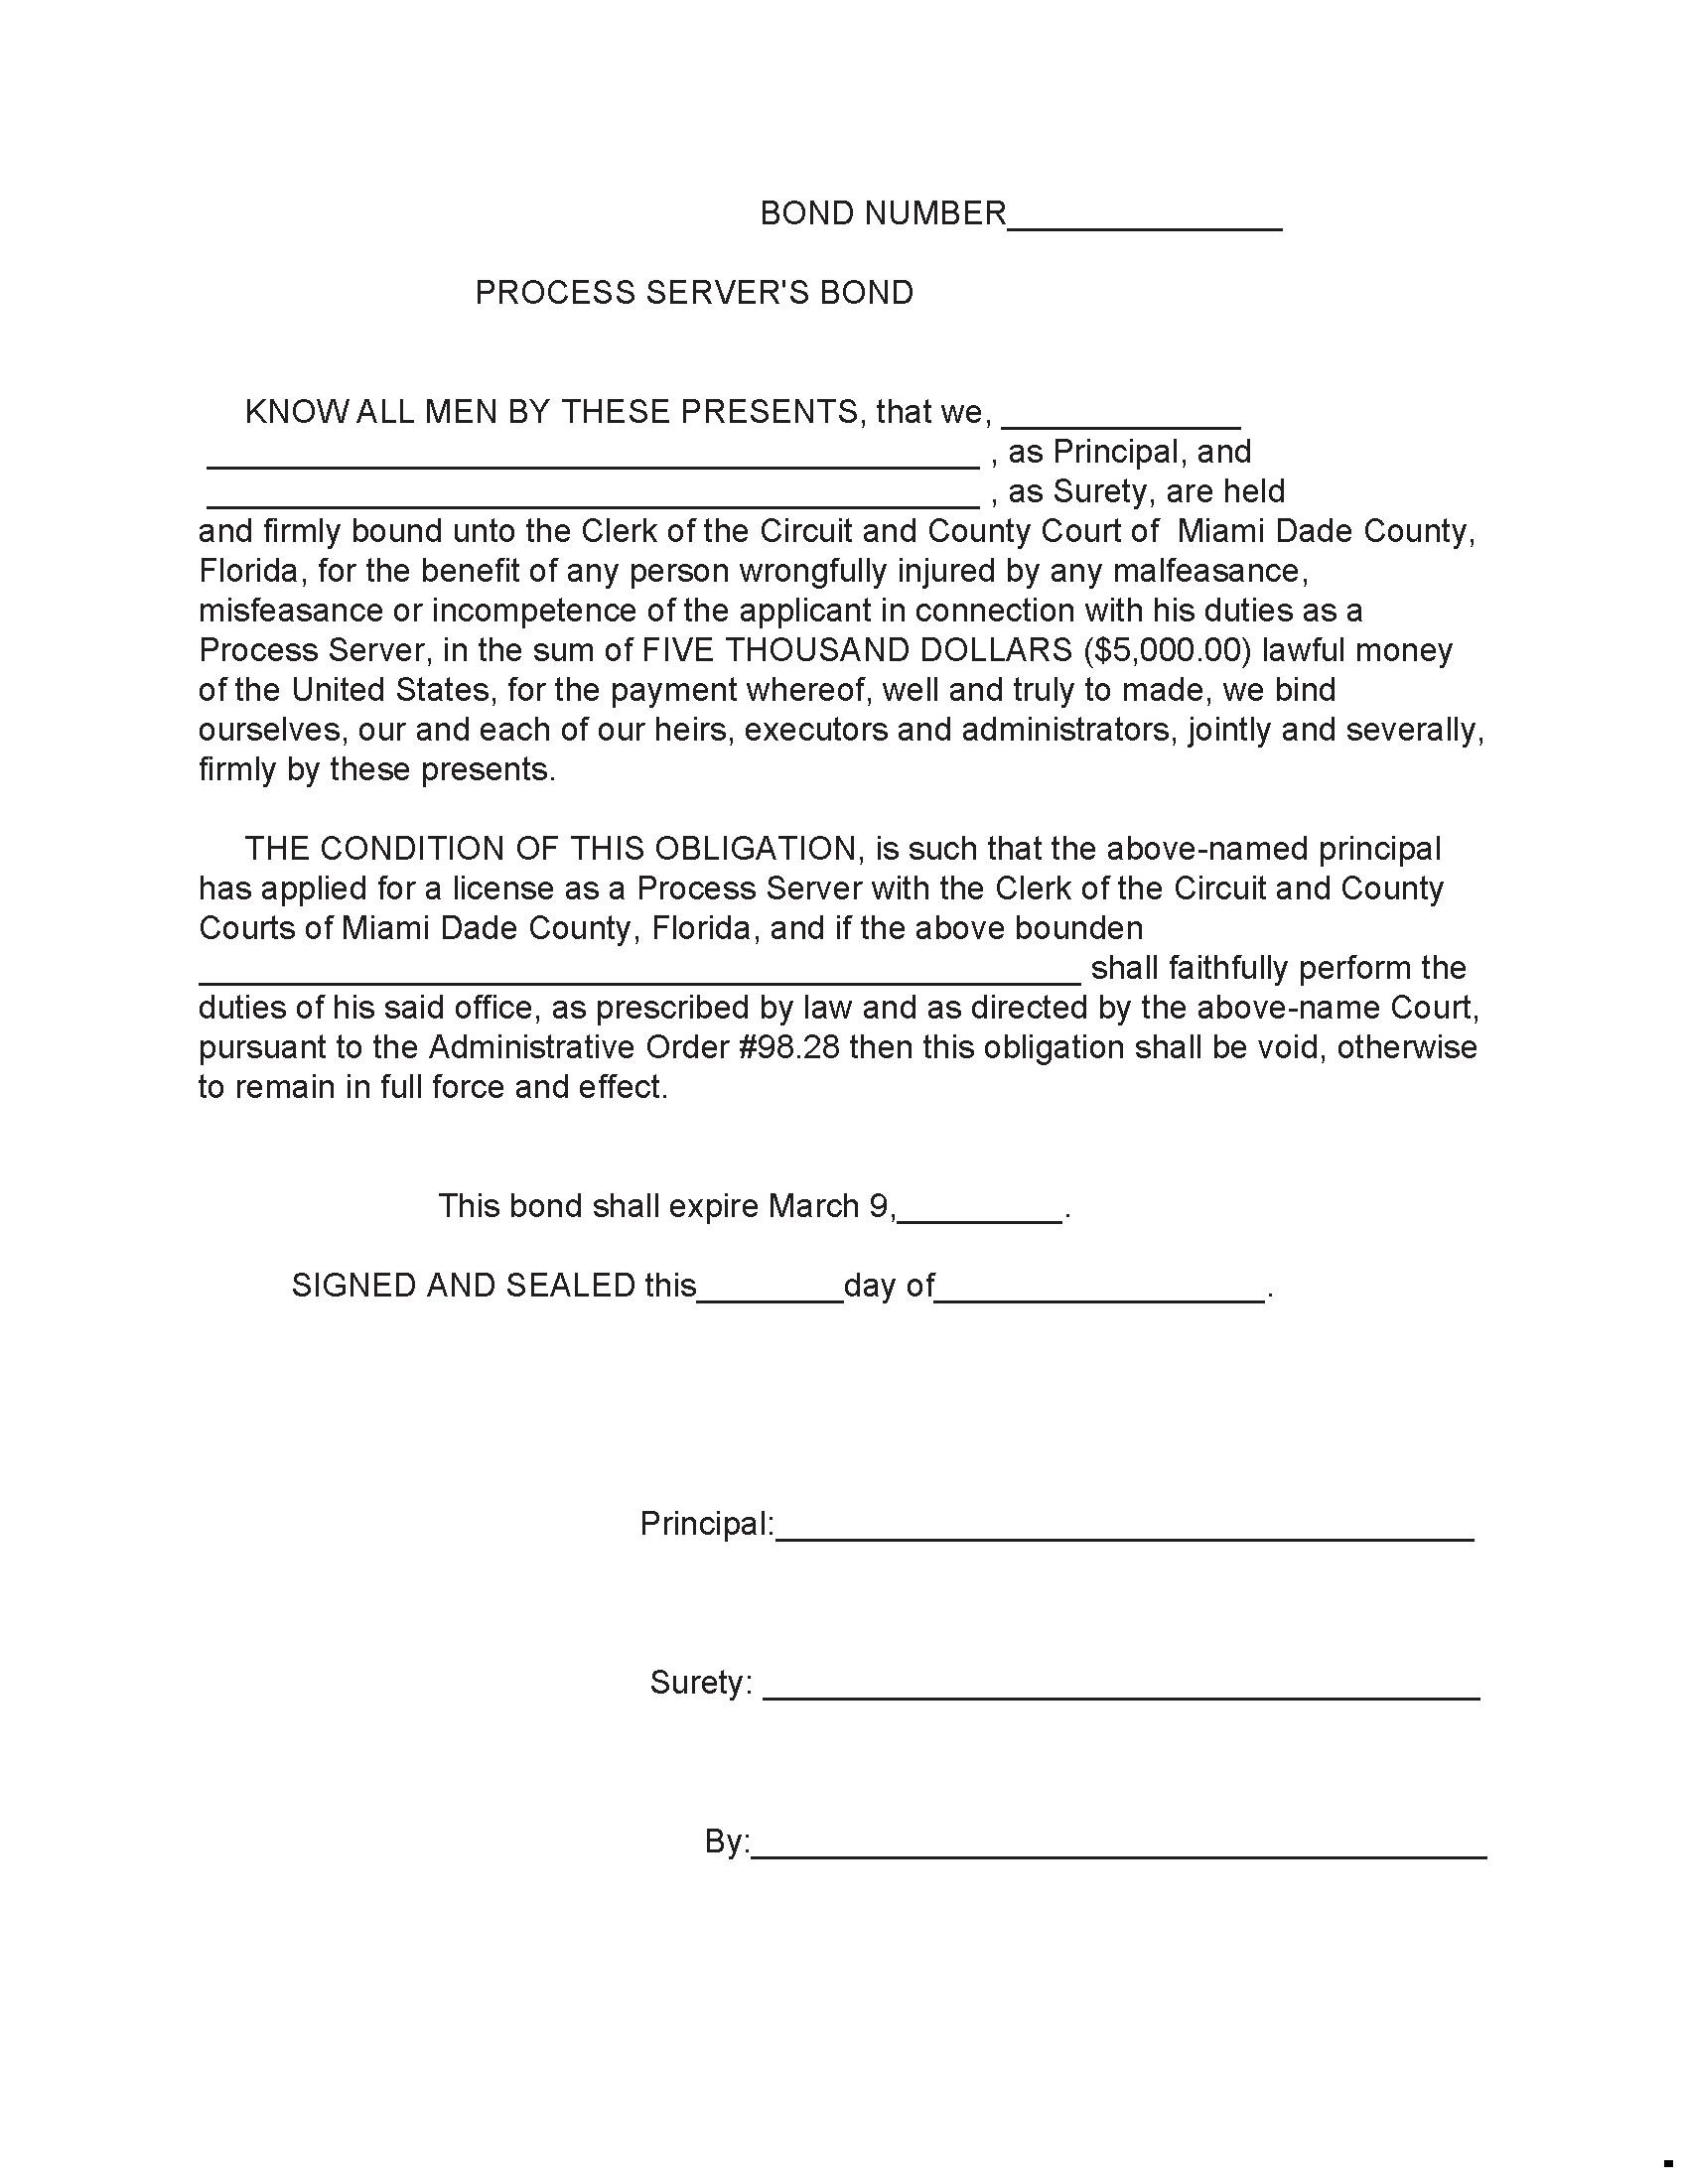 11th Judicial Circuit Court 11th Judicial Circuit Court Process Server Bond sample image